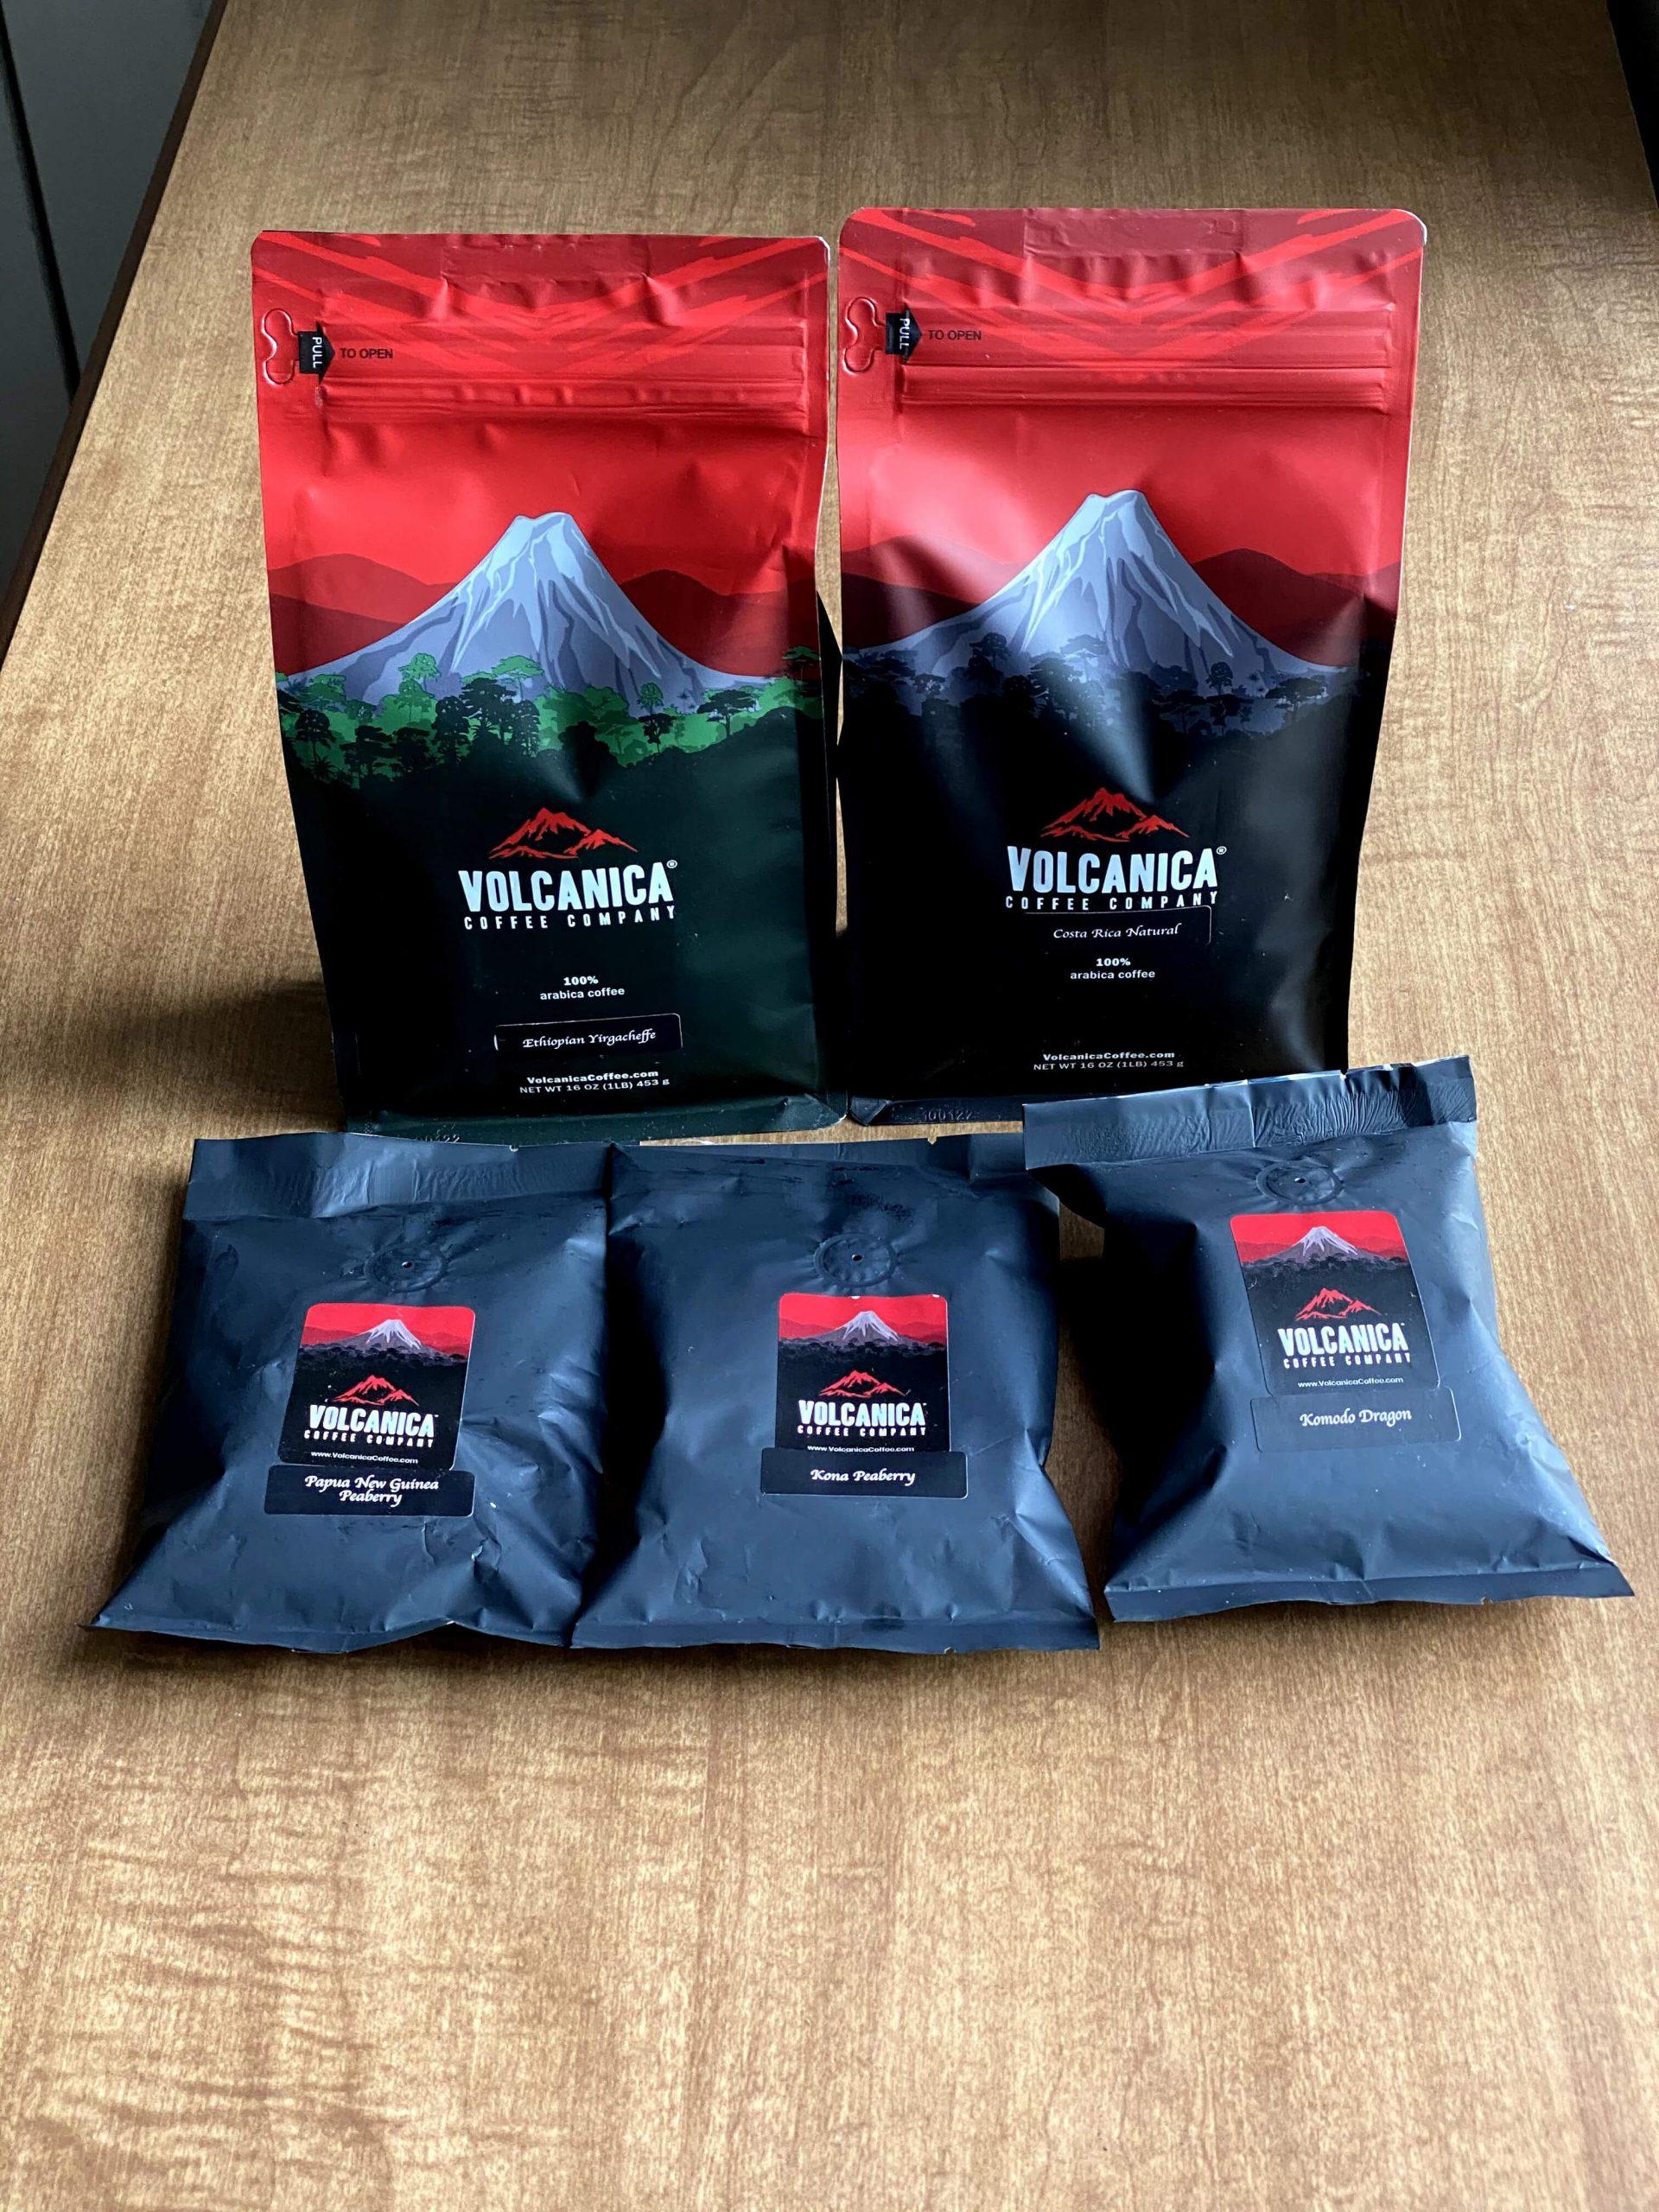 Volcanica Coffees